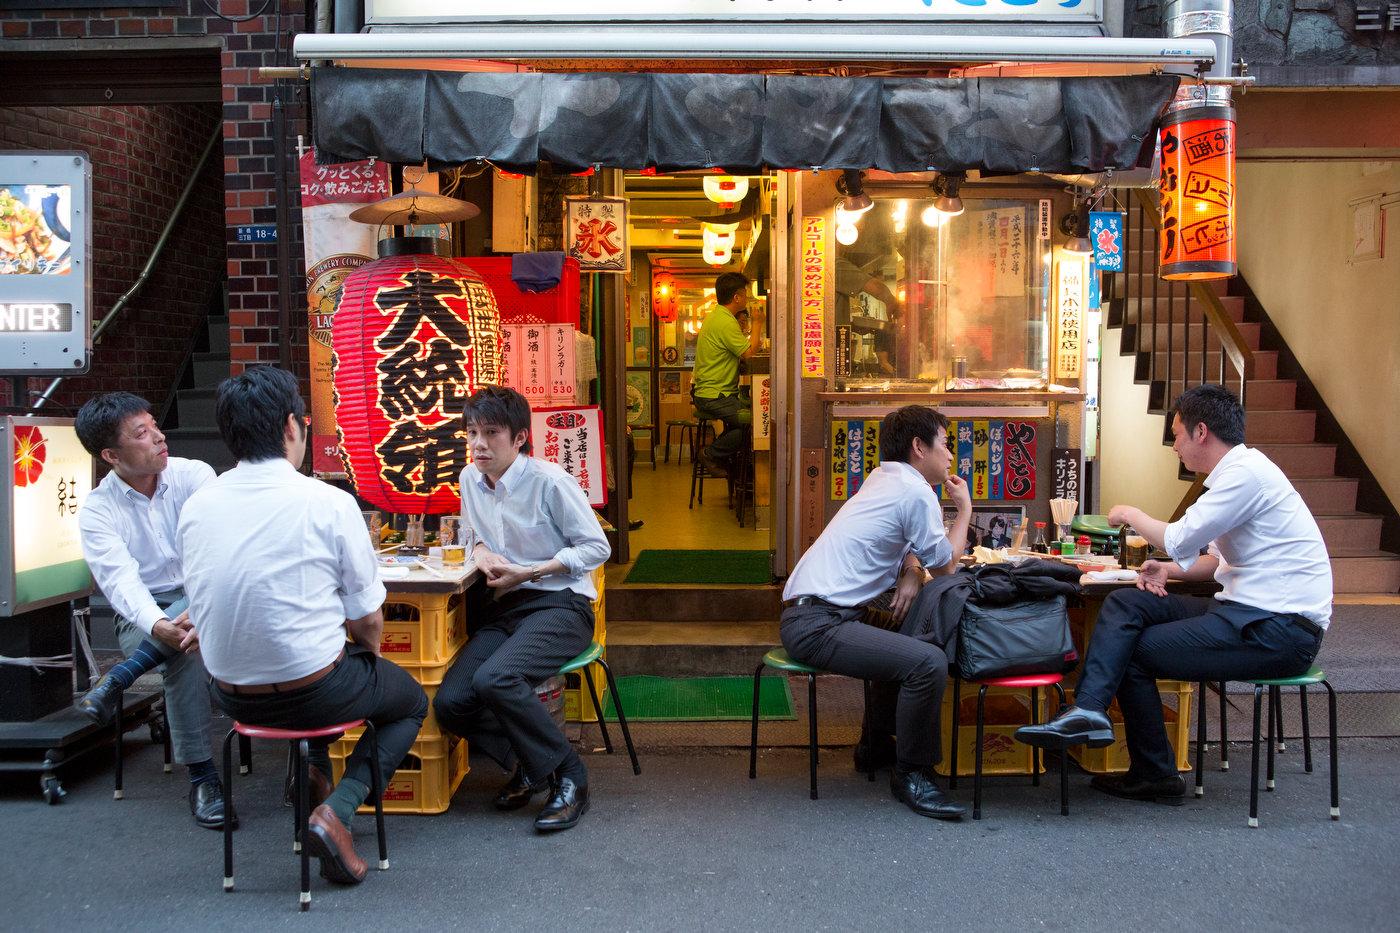 Salarymen after work, Shimbashi.